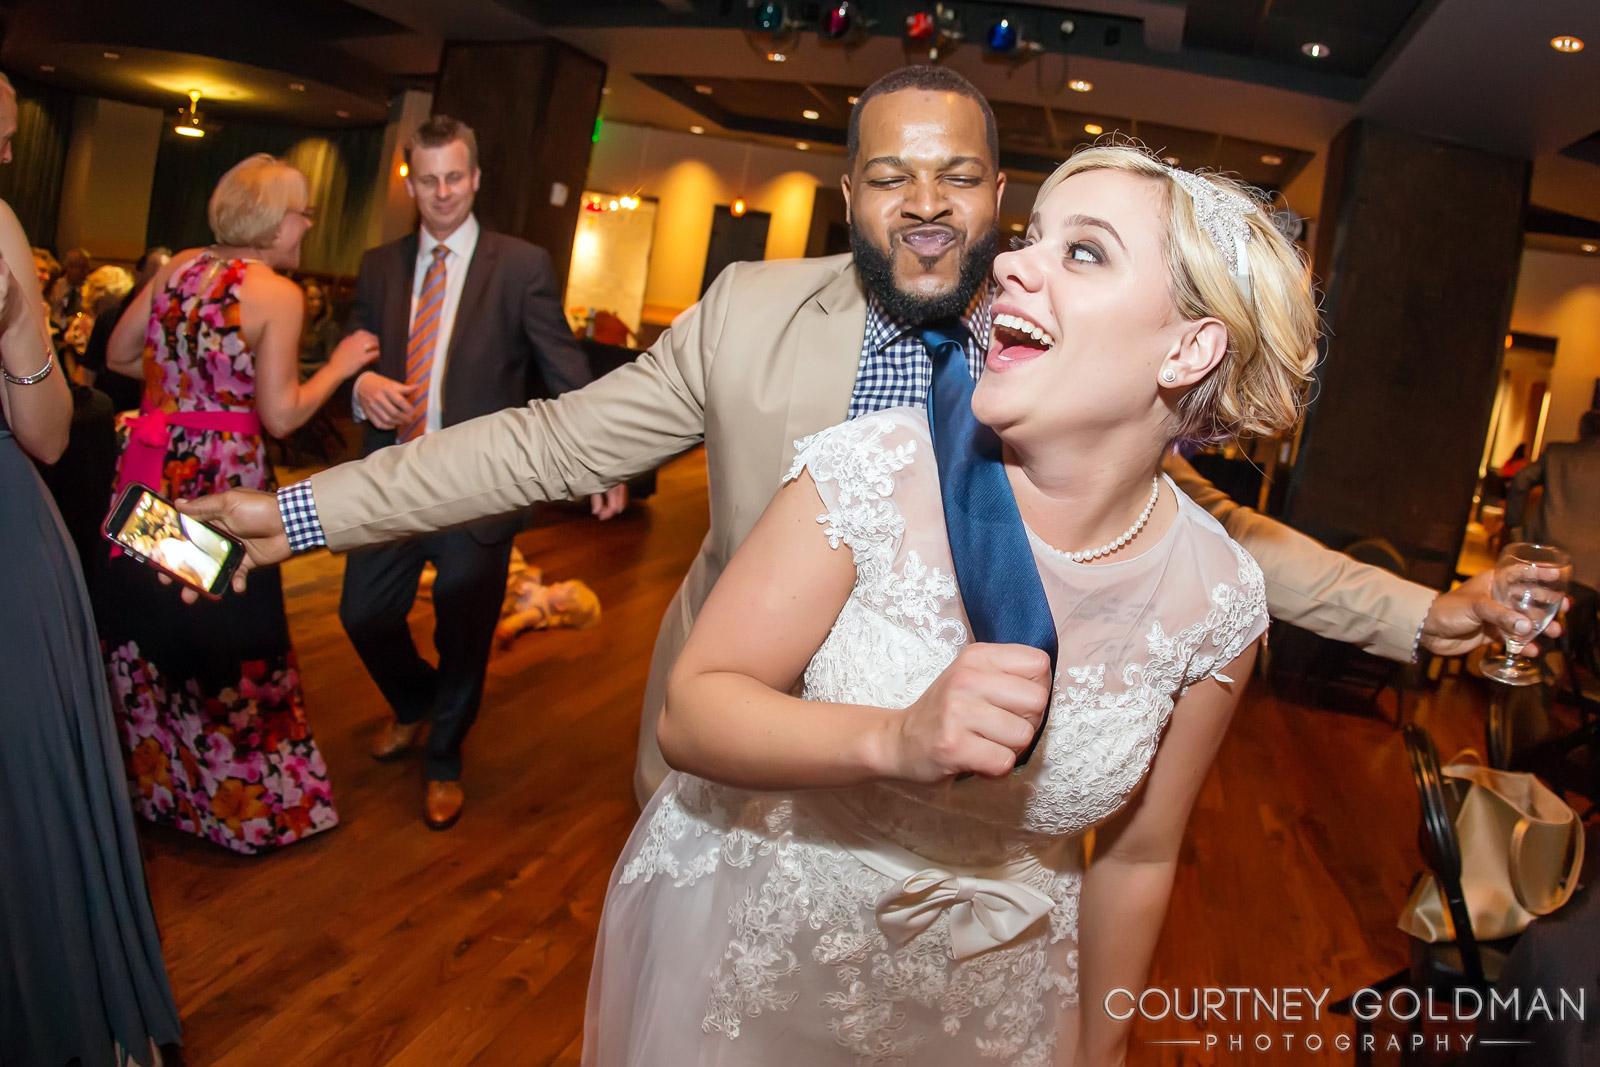 Atlanta-Wedding-Photography-by-Courtney-Goldman-76.jpg